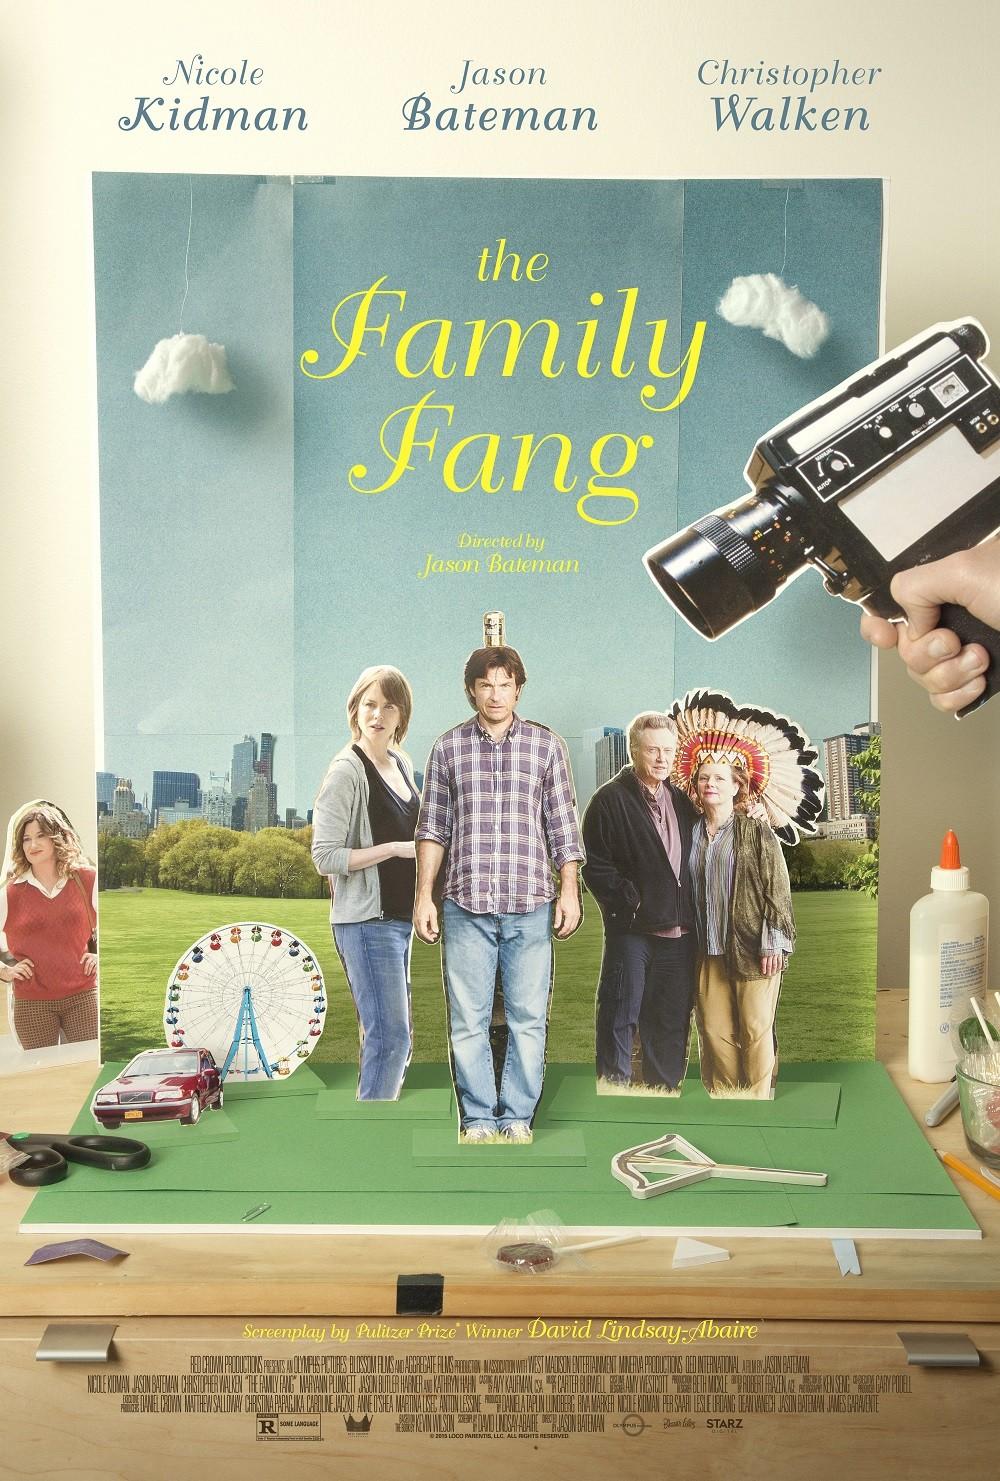 ThefamilyFang